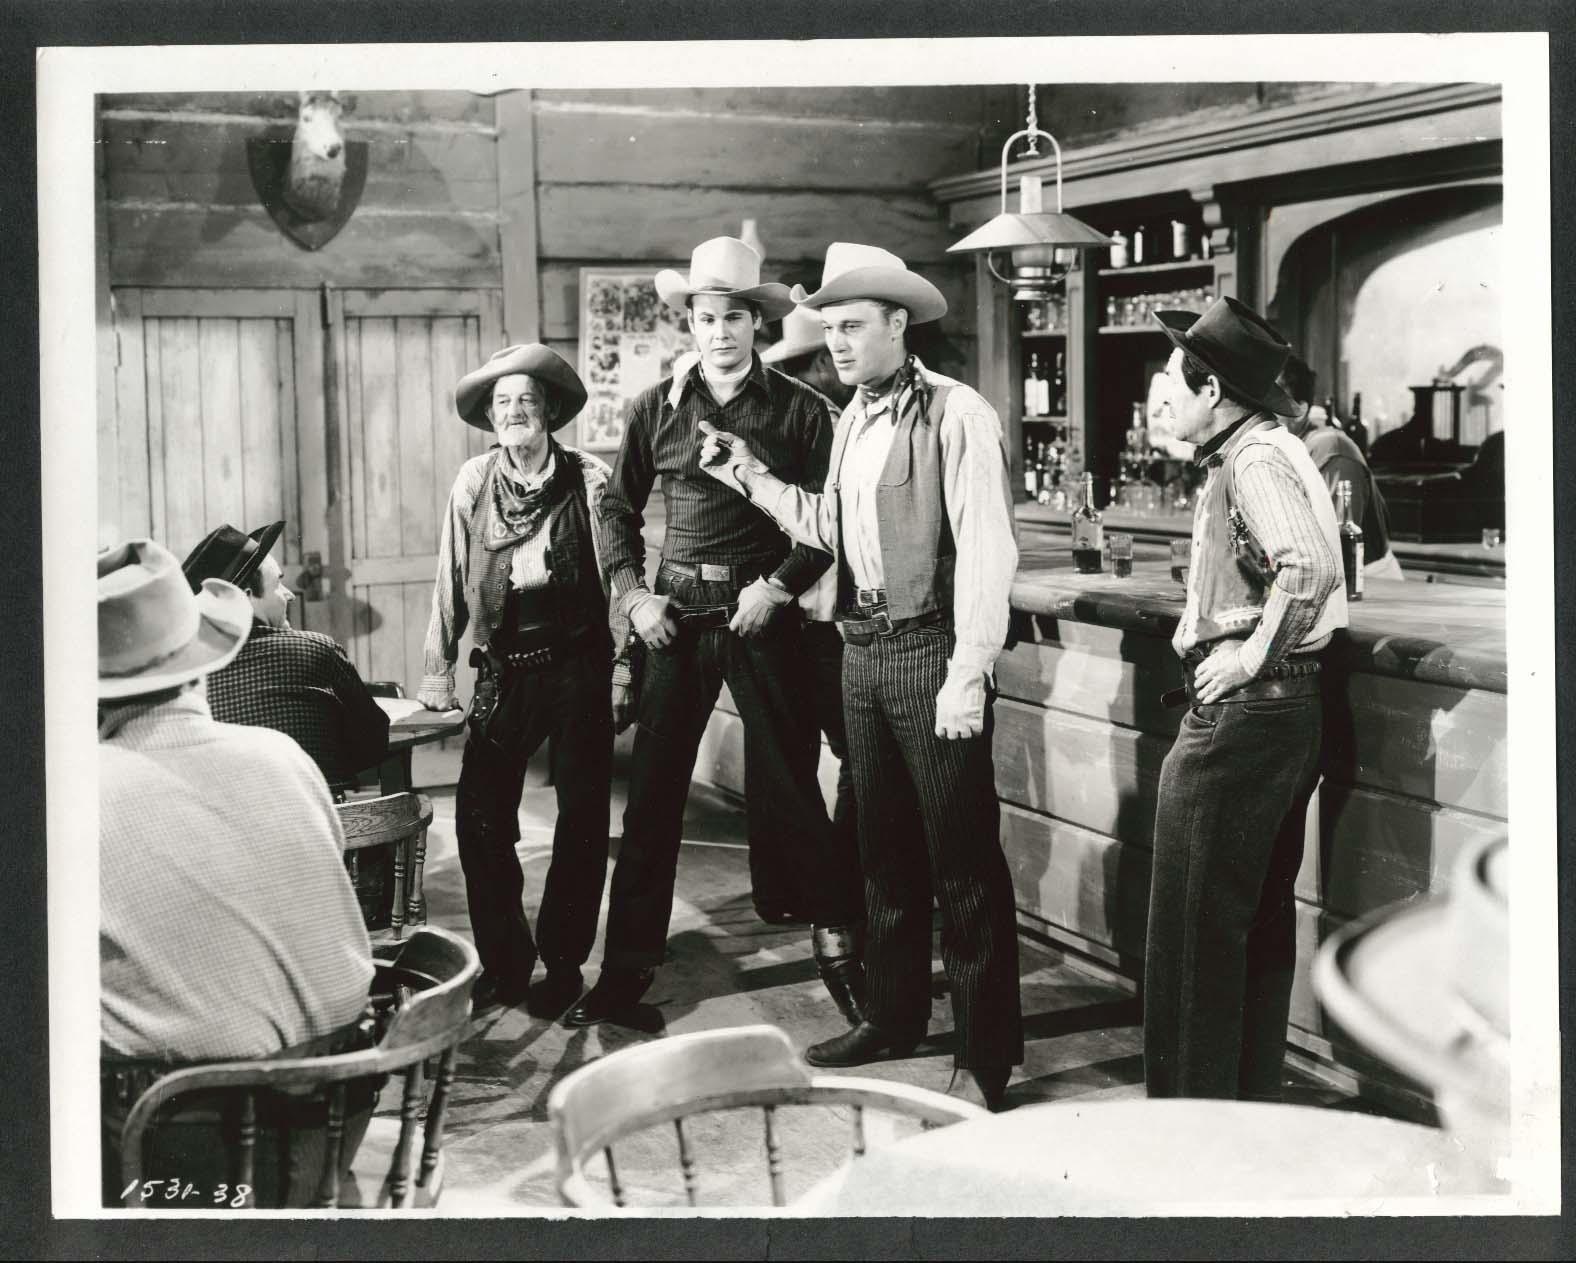 Image for Sunset Carson Robert Wilke 8x10 photograph 1940s